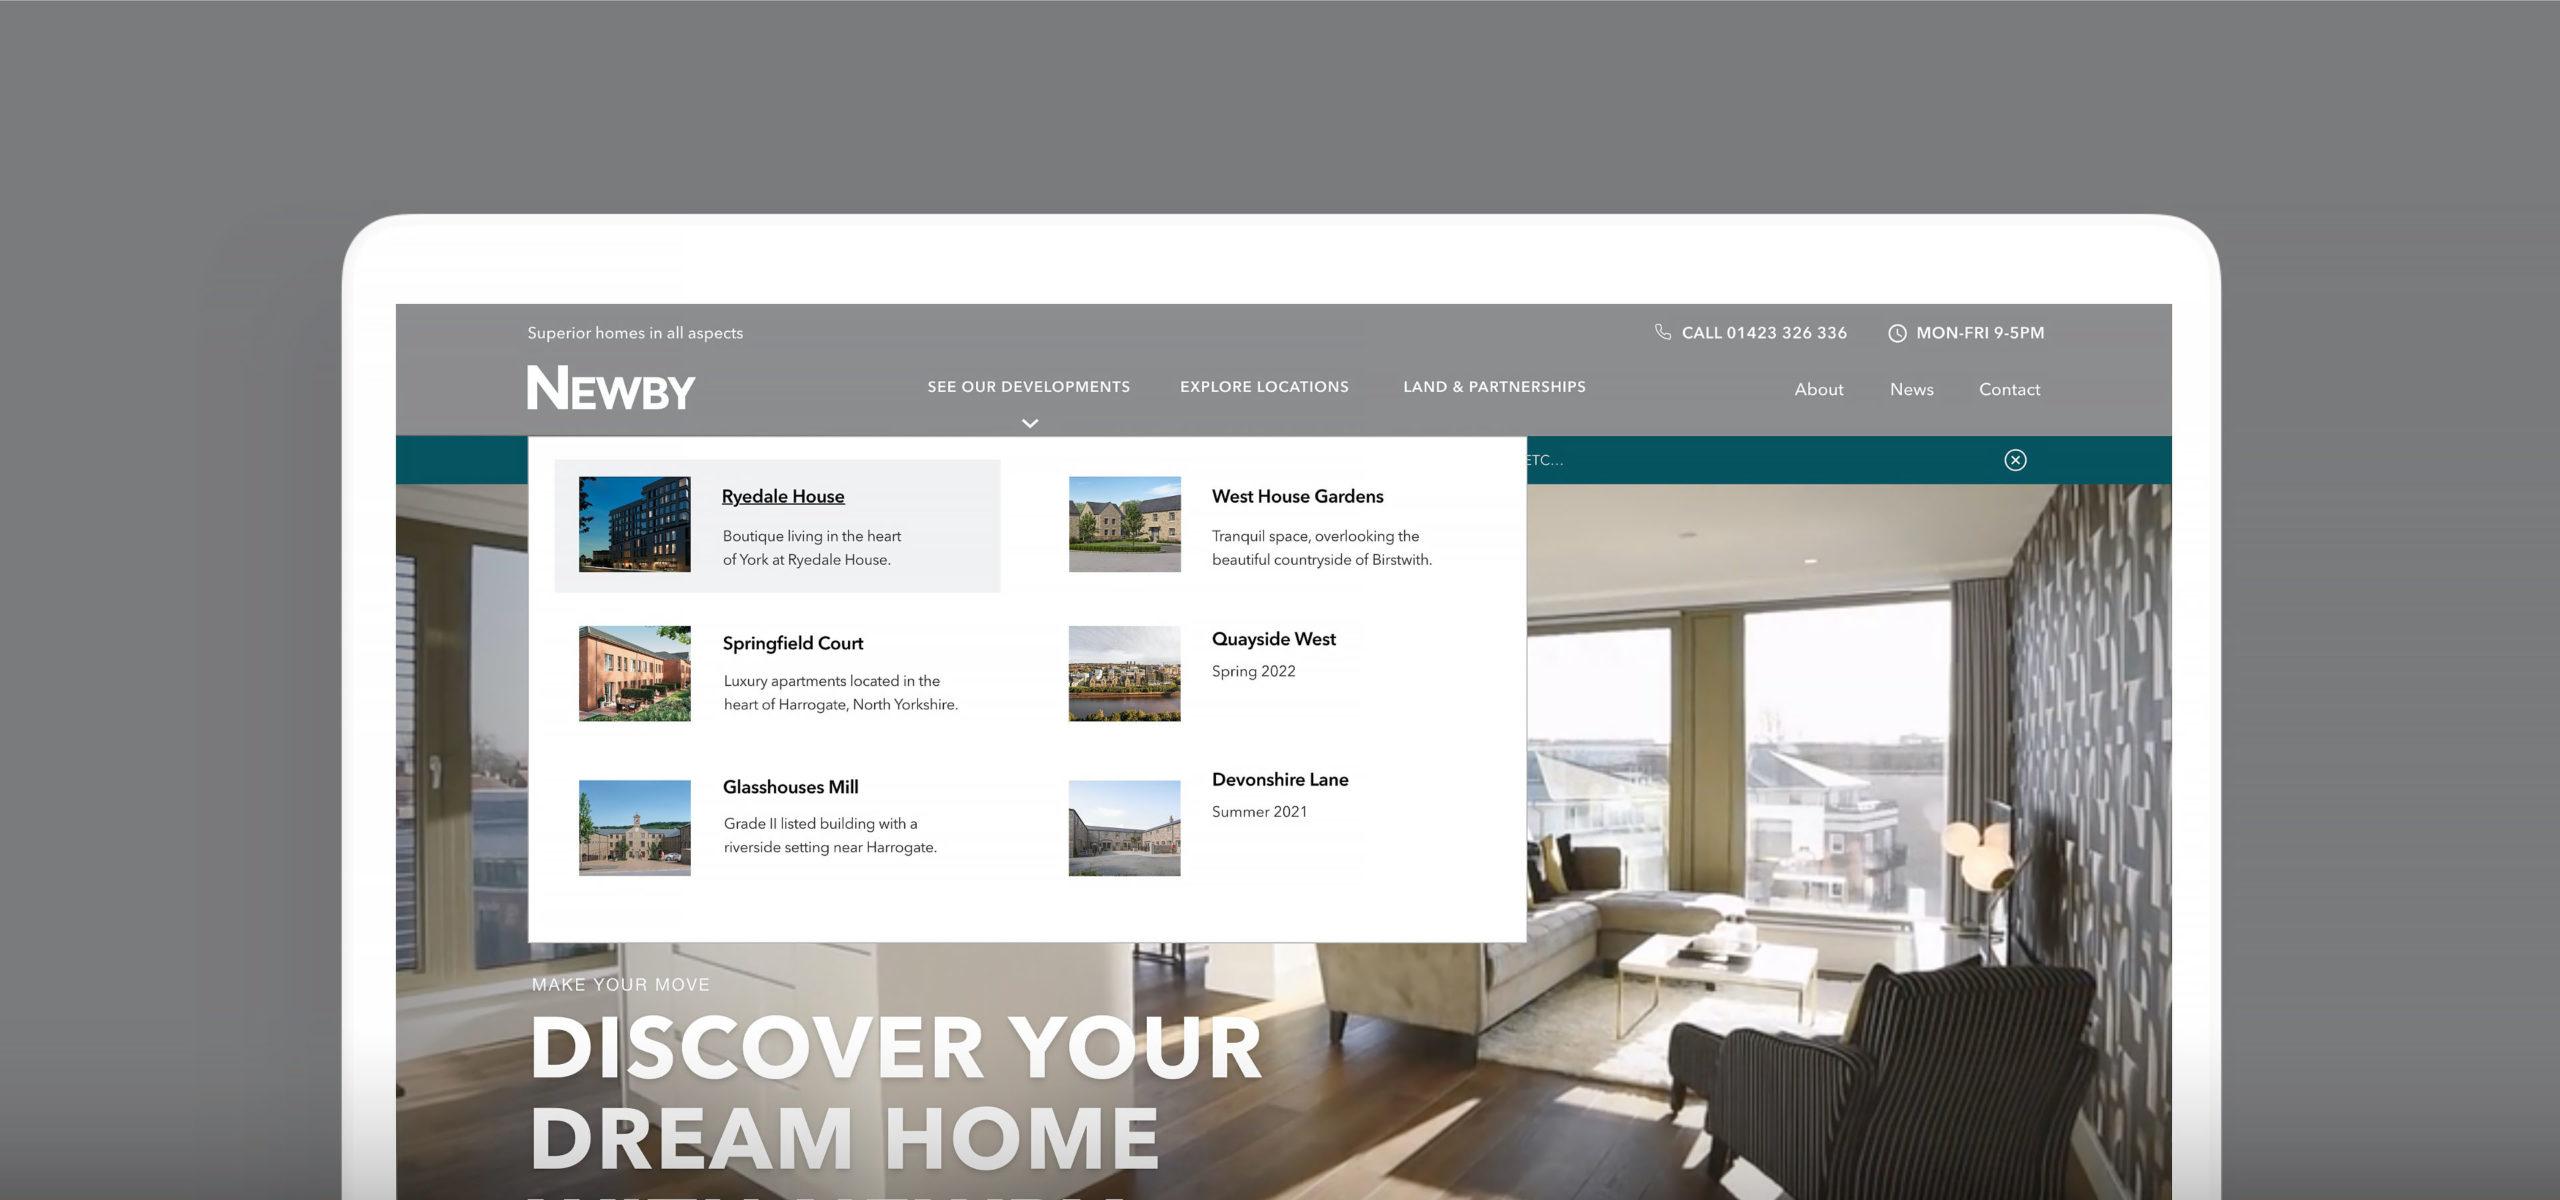 Newby Homes new website